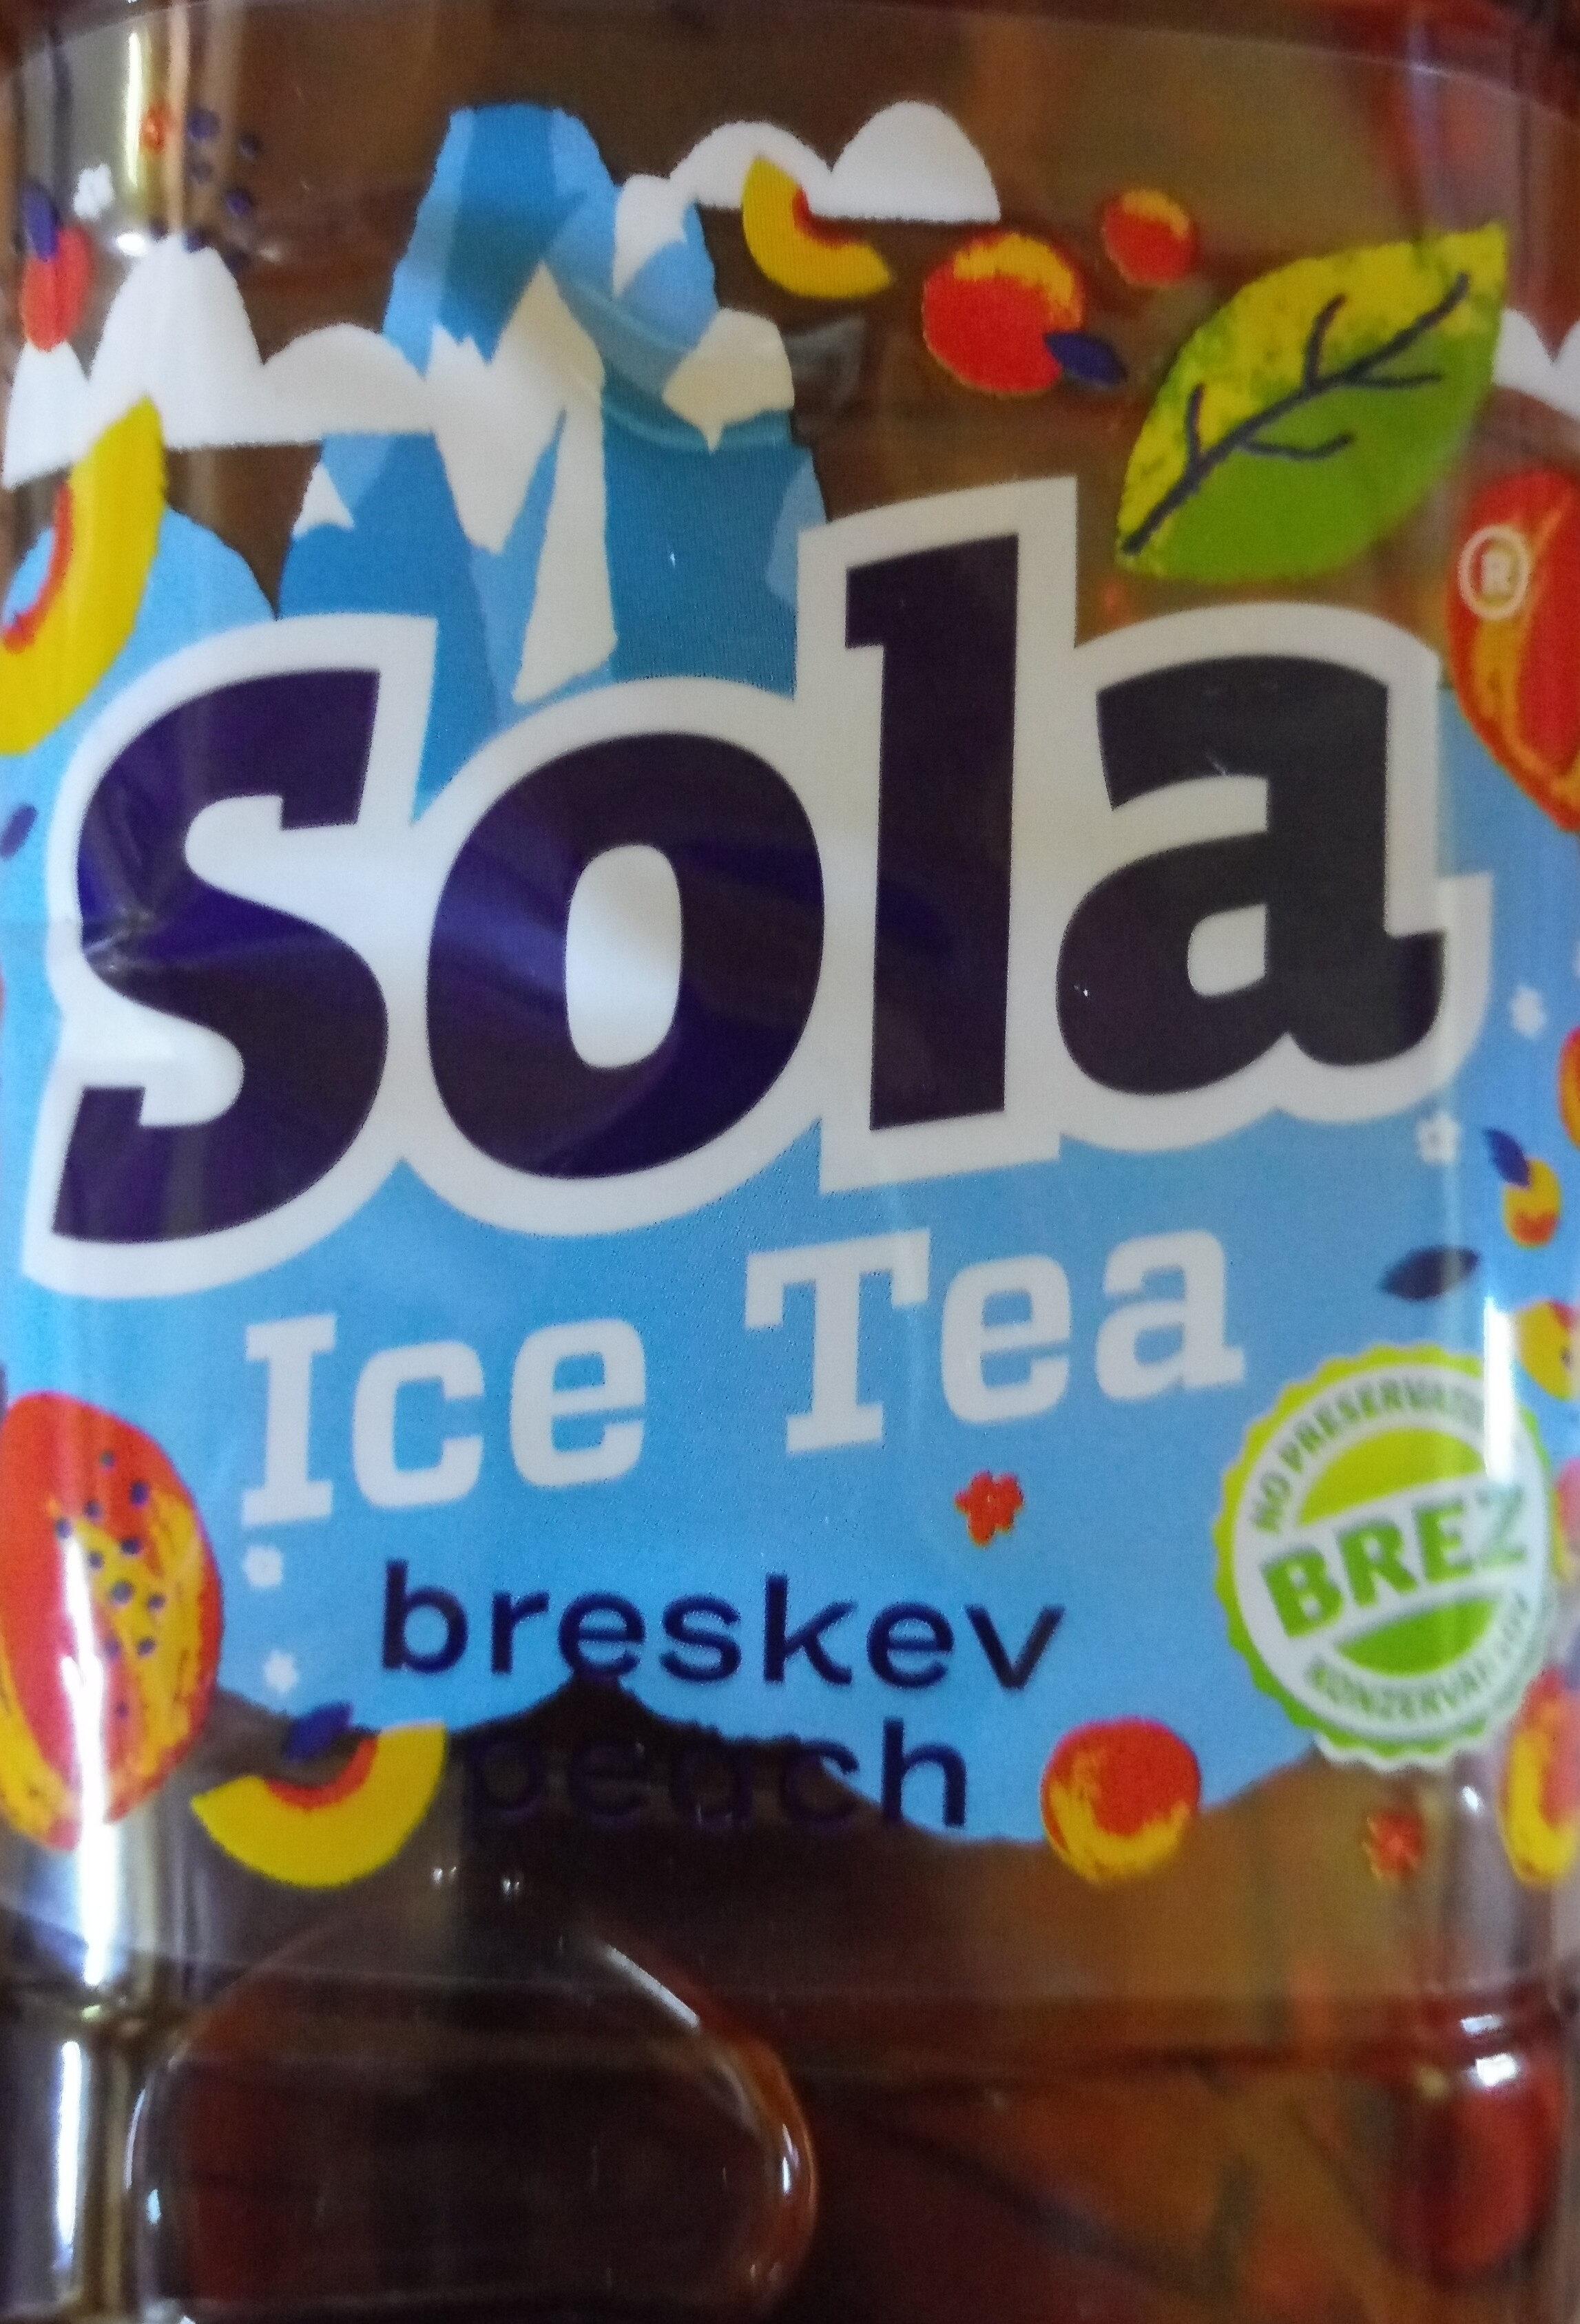 Sola Ice Tea breskev peach - Product